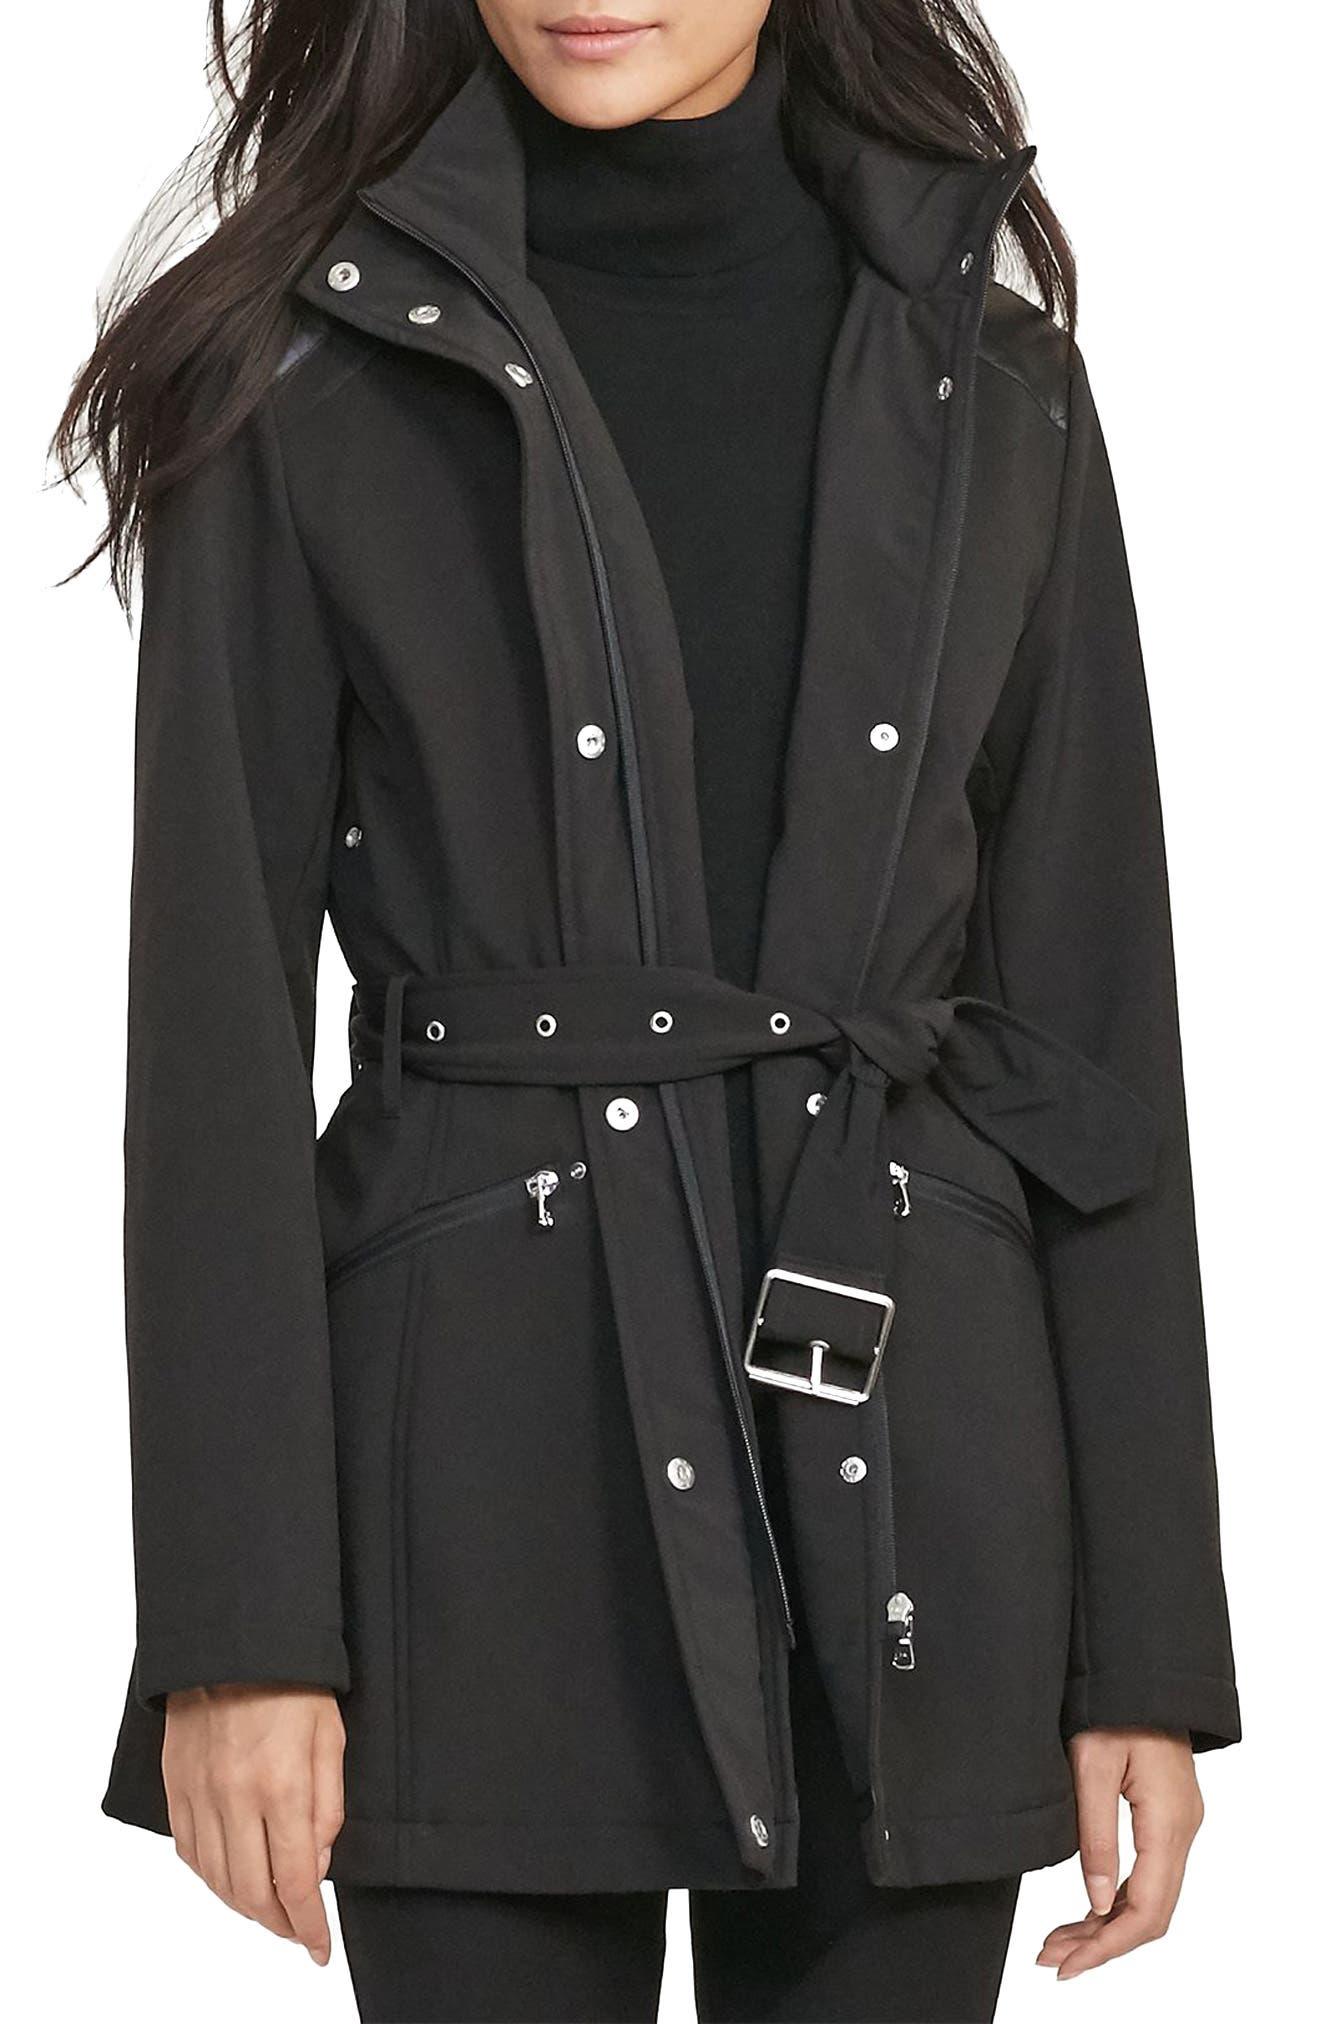 Main Image - Lauren Ralph Lauren Belted Hooded Soft Shell Jacket